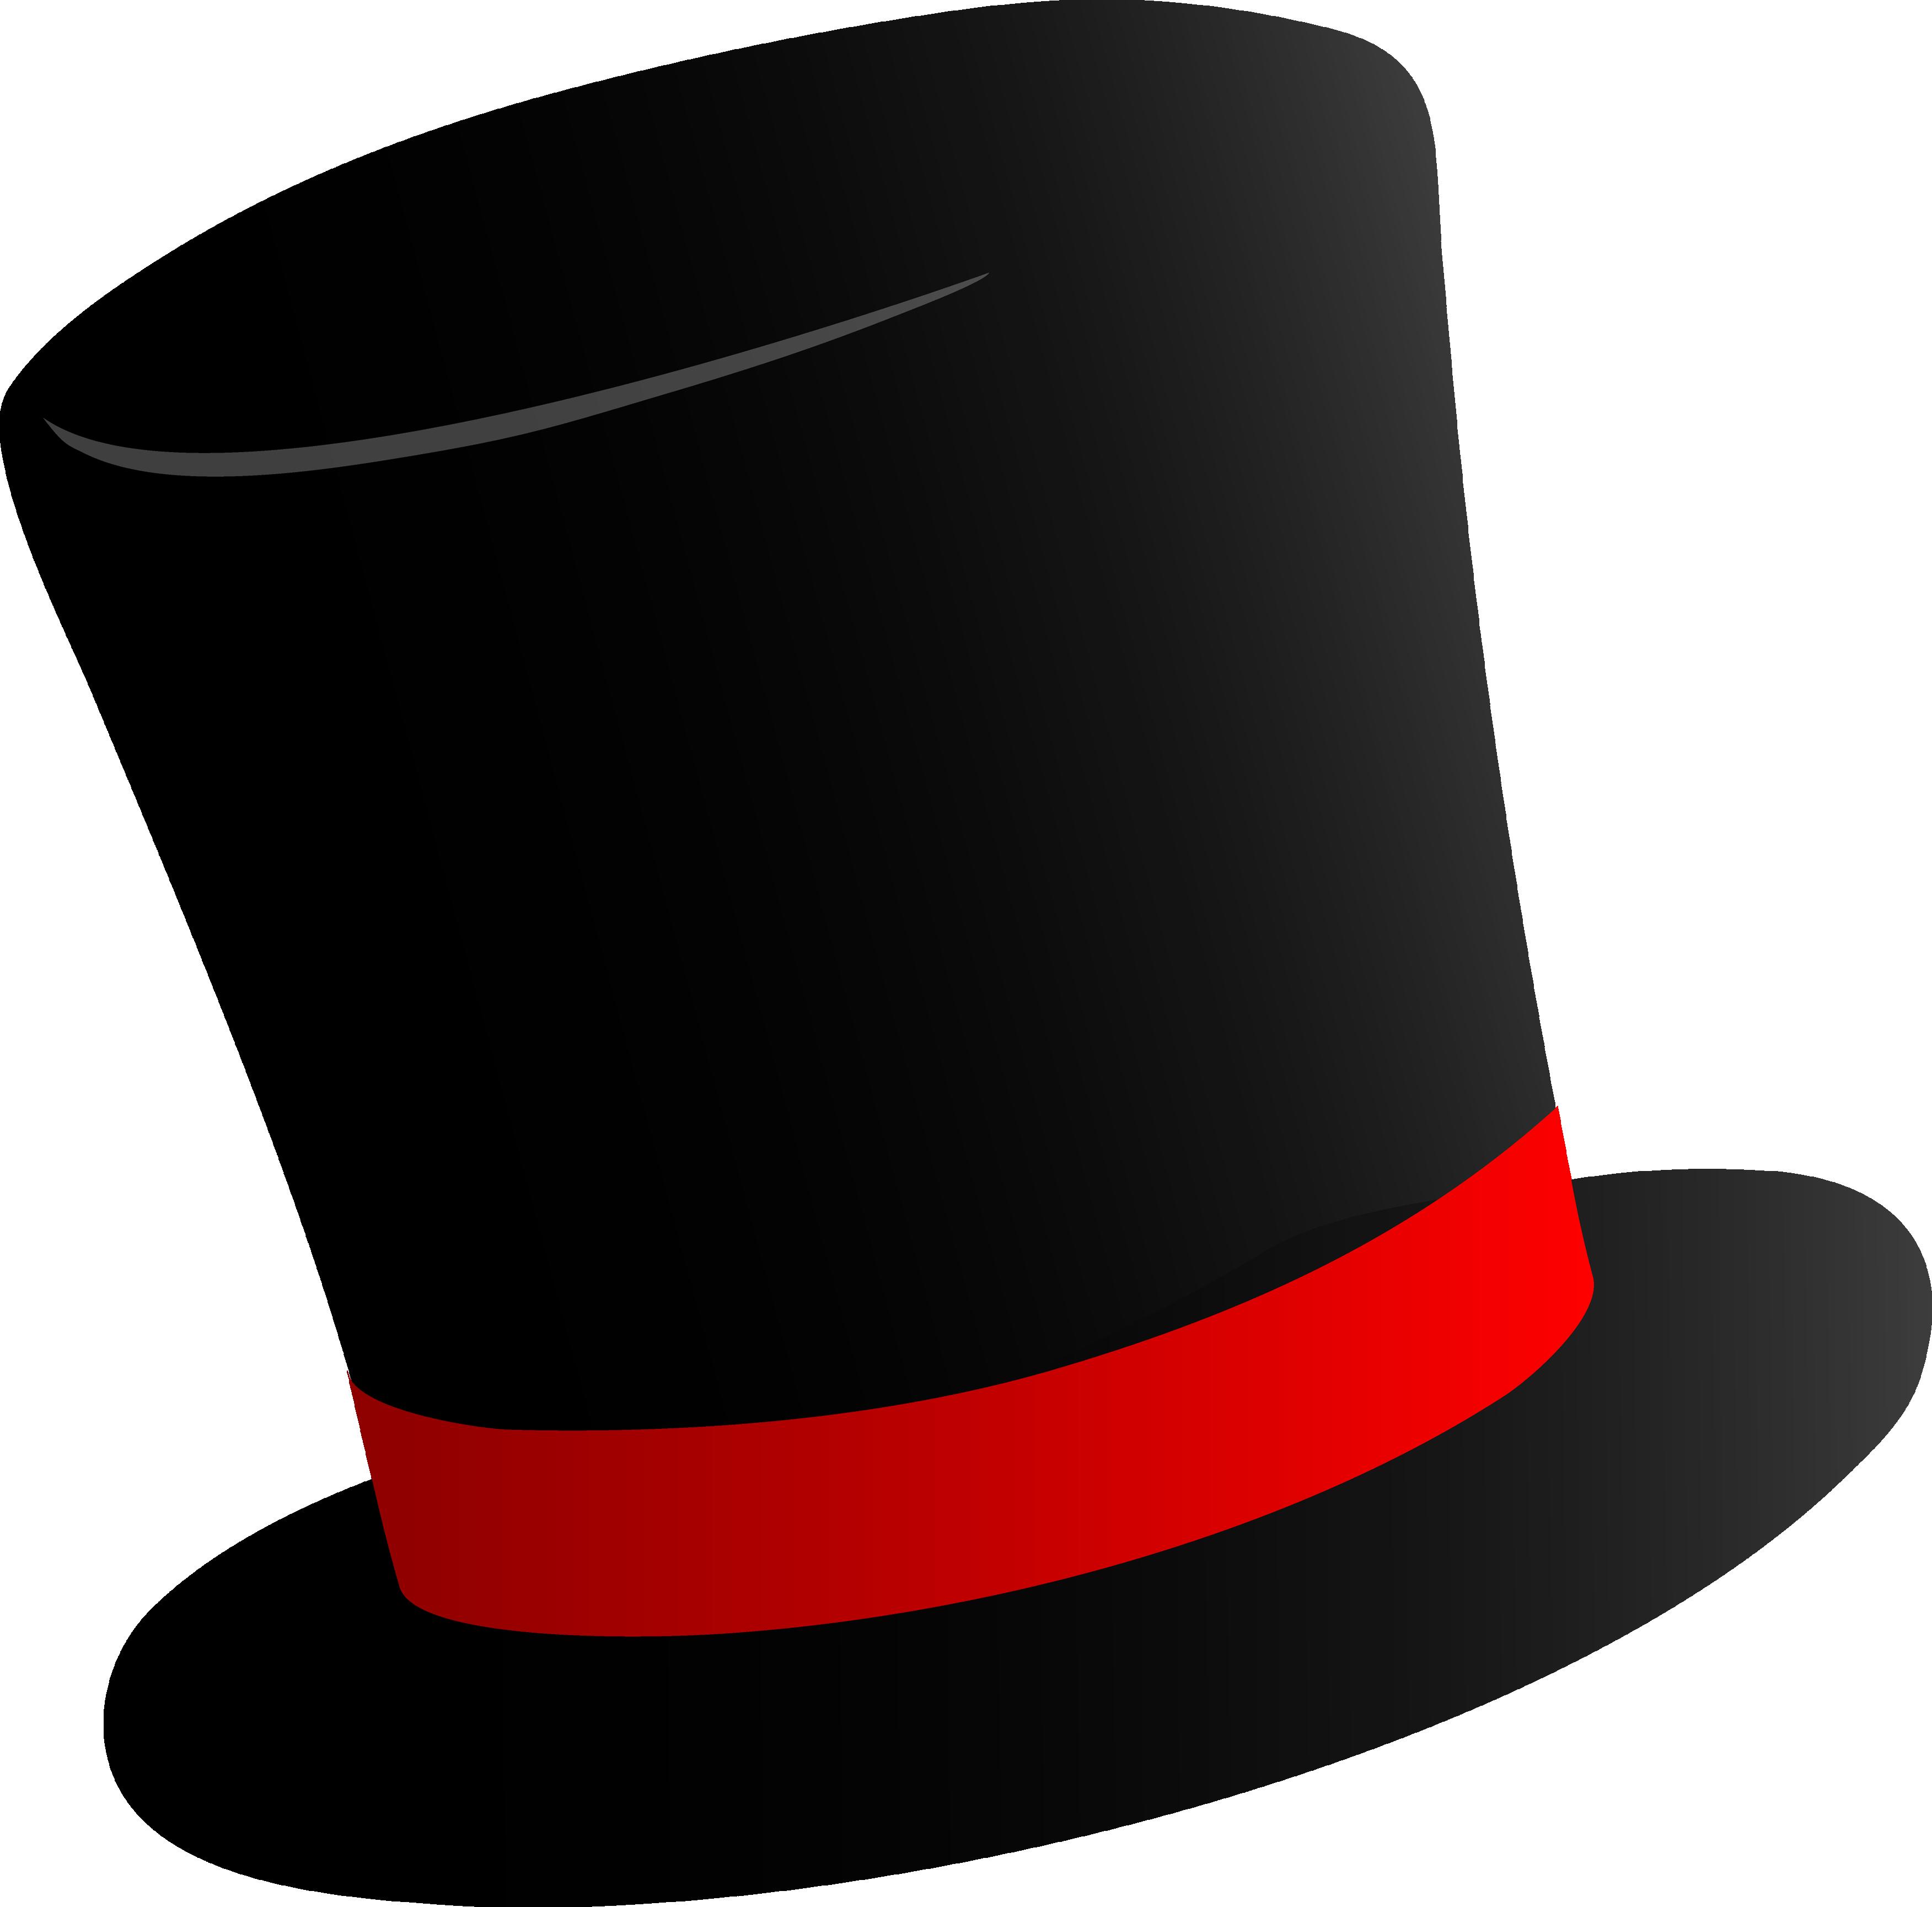 image free stock Black Top Hat PNG Image